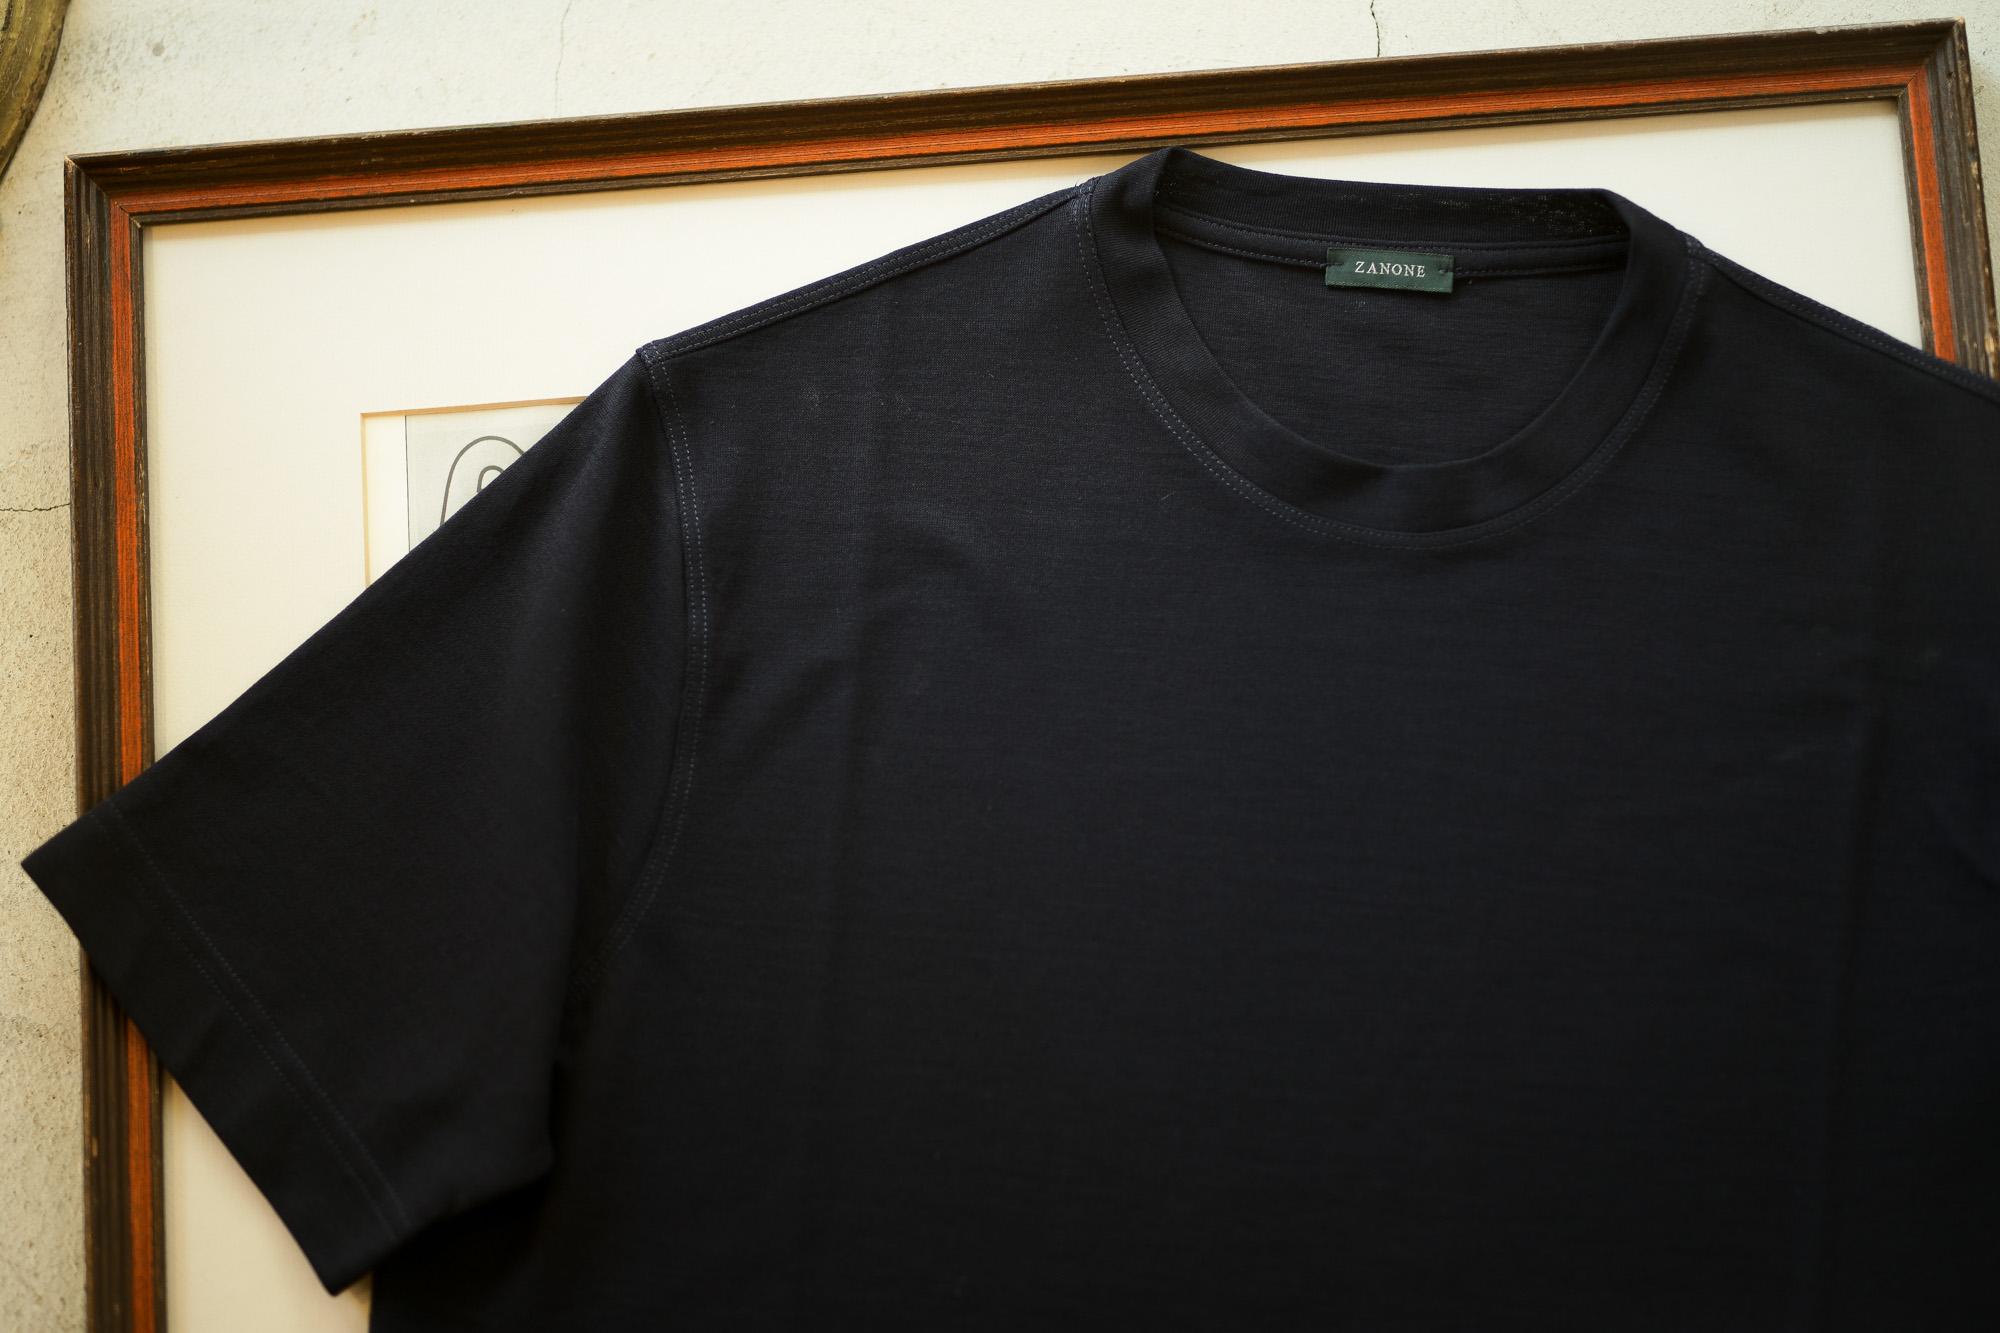 ZANONE (ザノーネ) Crew Neck T-shirt (クルーネックTシャツ) ice cotton アイスコットン Tシャツ NAVY (ネイビー・Z0542) MADE IN ITALY(イタリア製) 2019 春夏新作 愛知 名古屋 altoediritto アルトエデリット